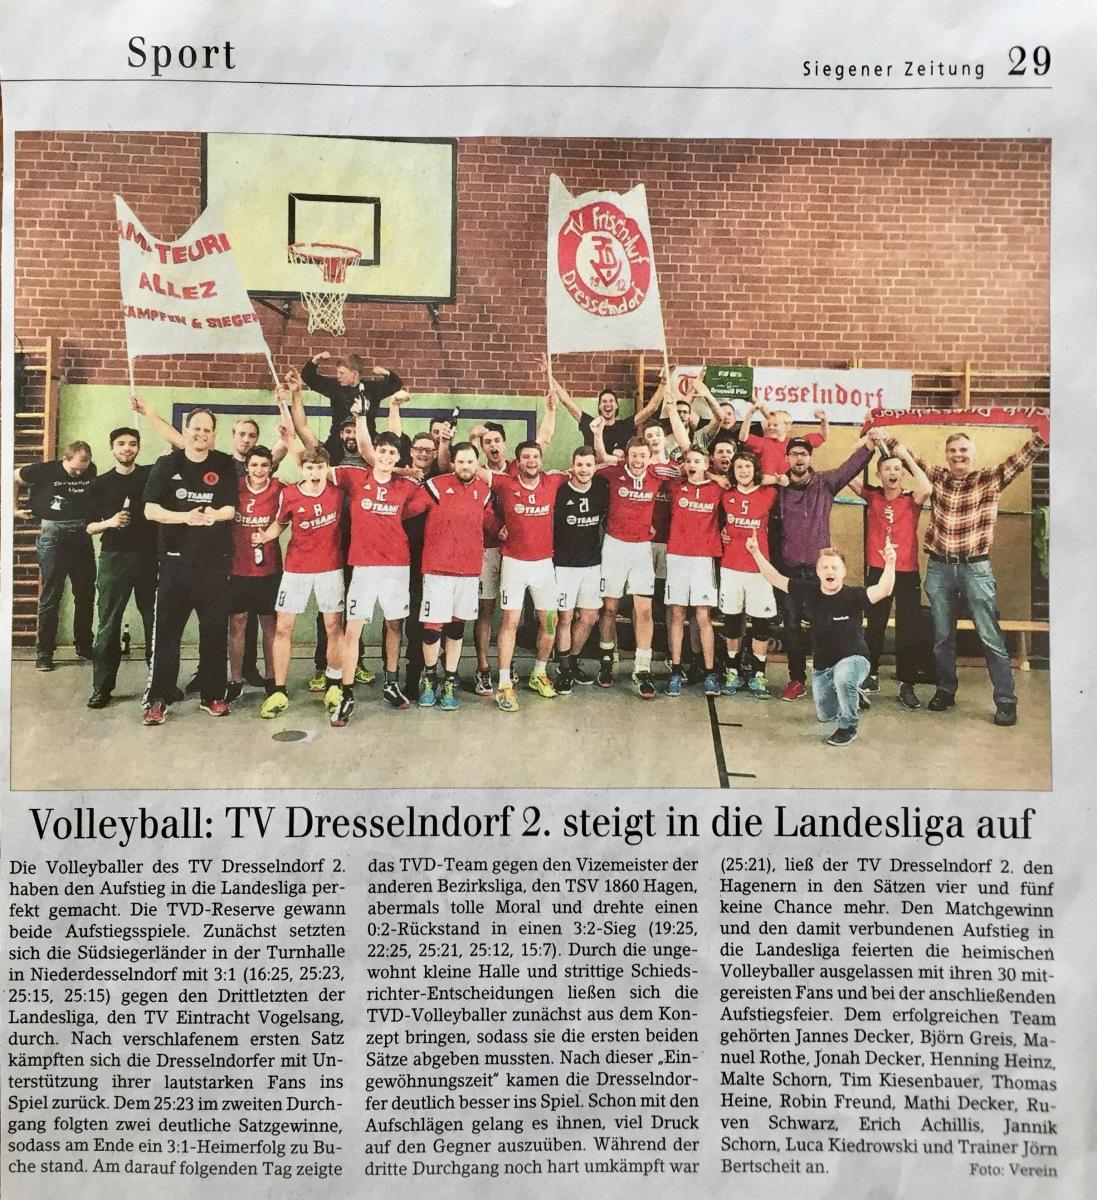 Bericht-Siegener-Zeitung